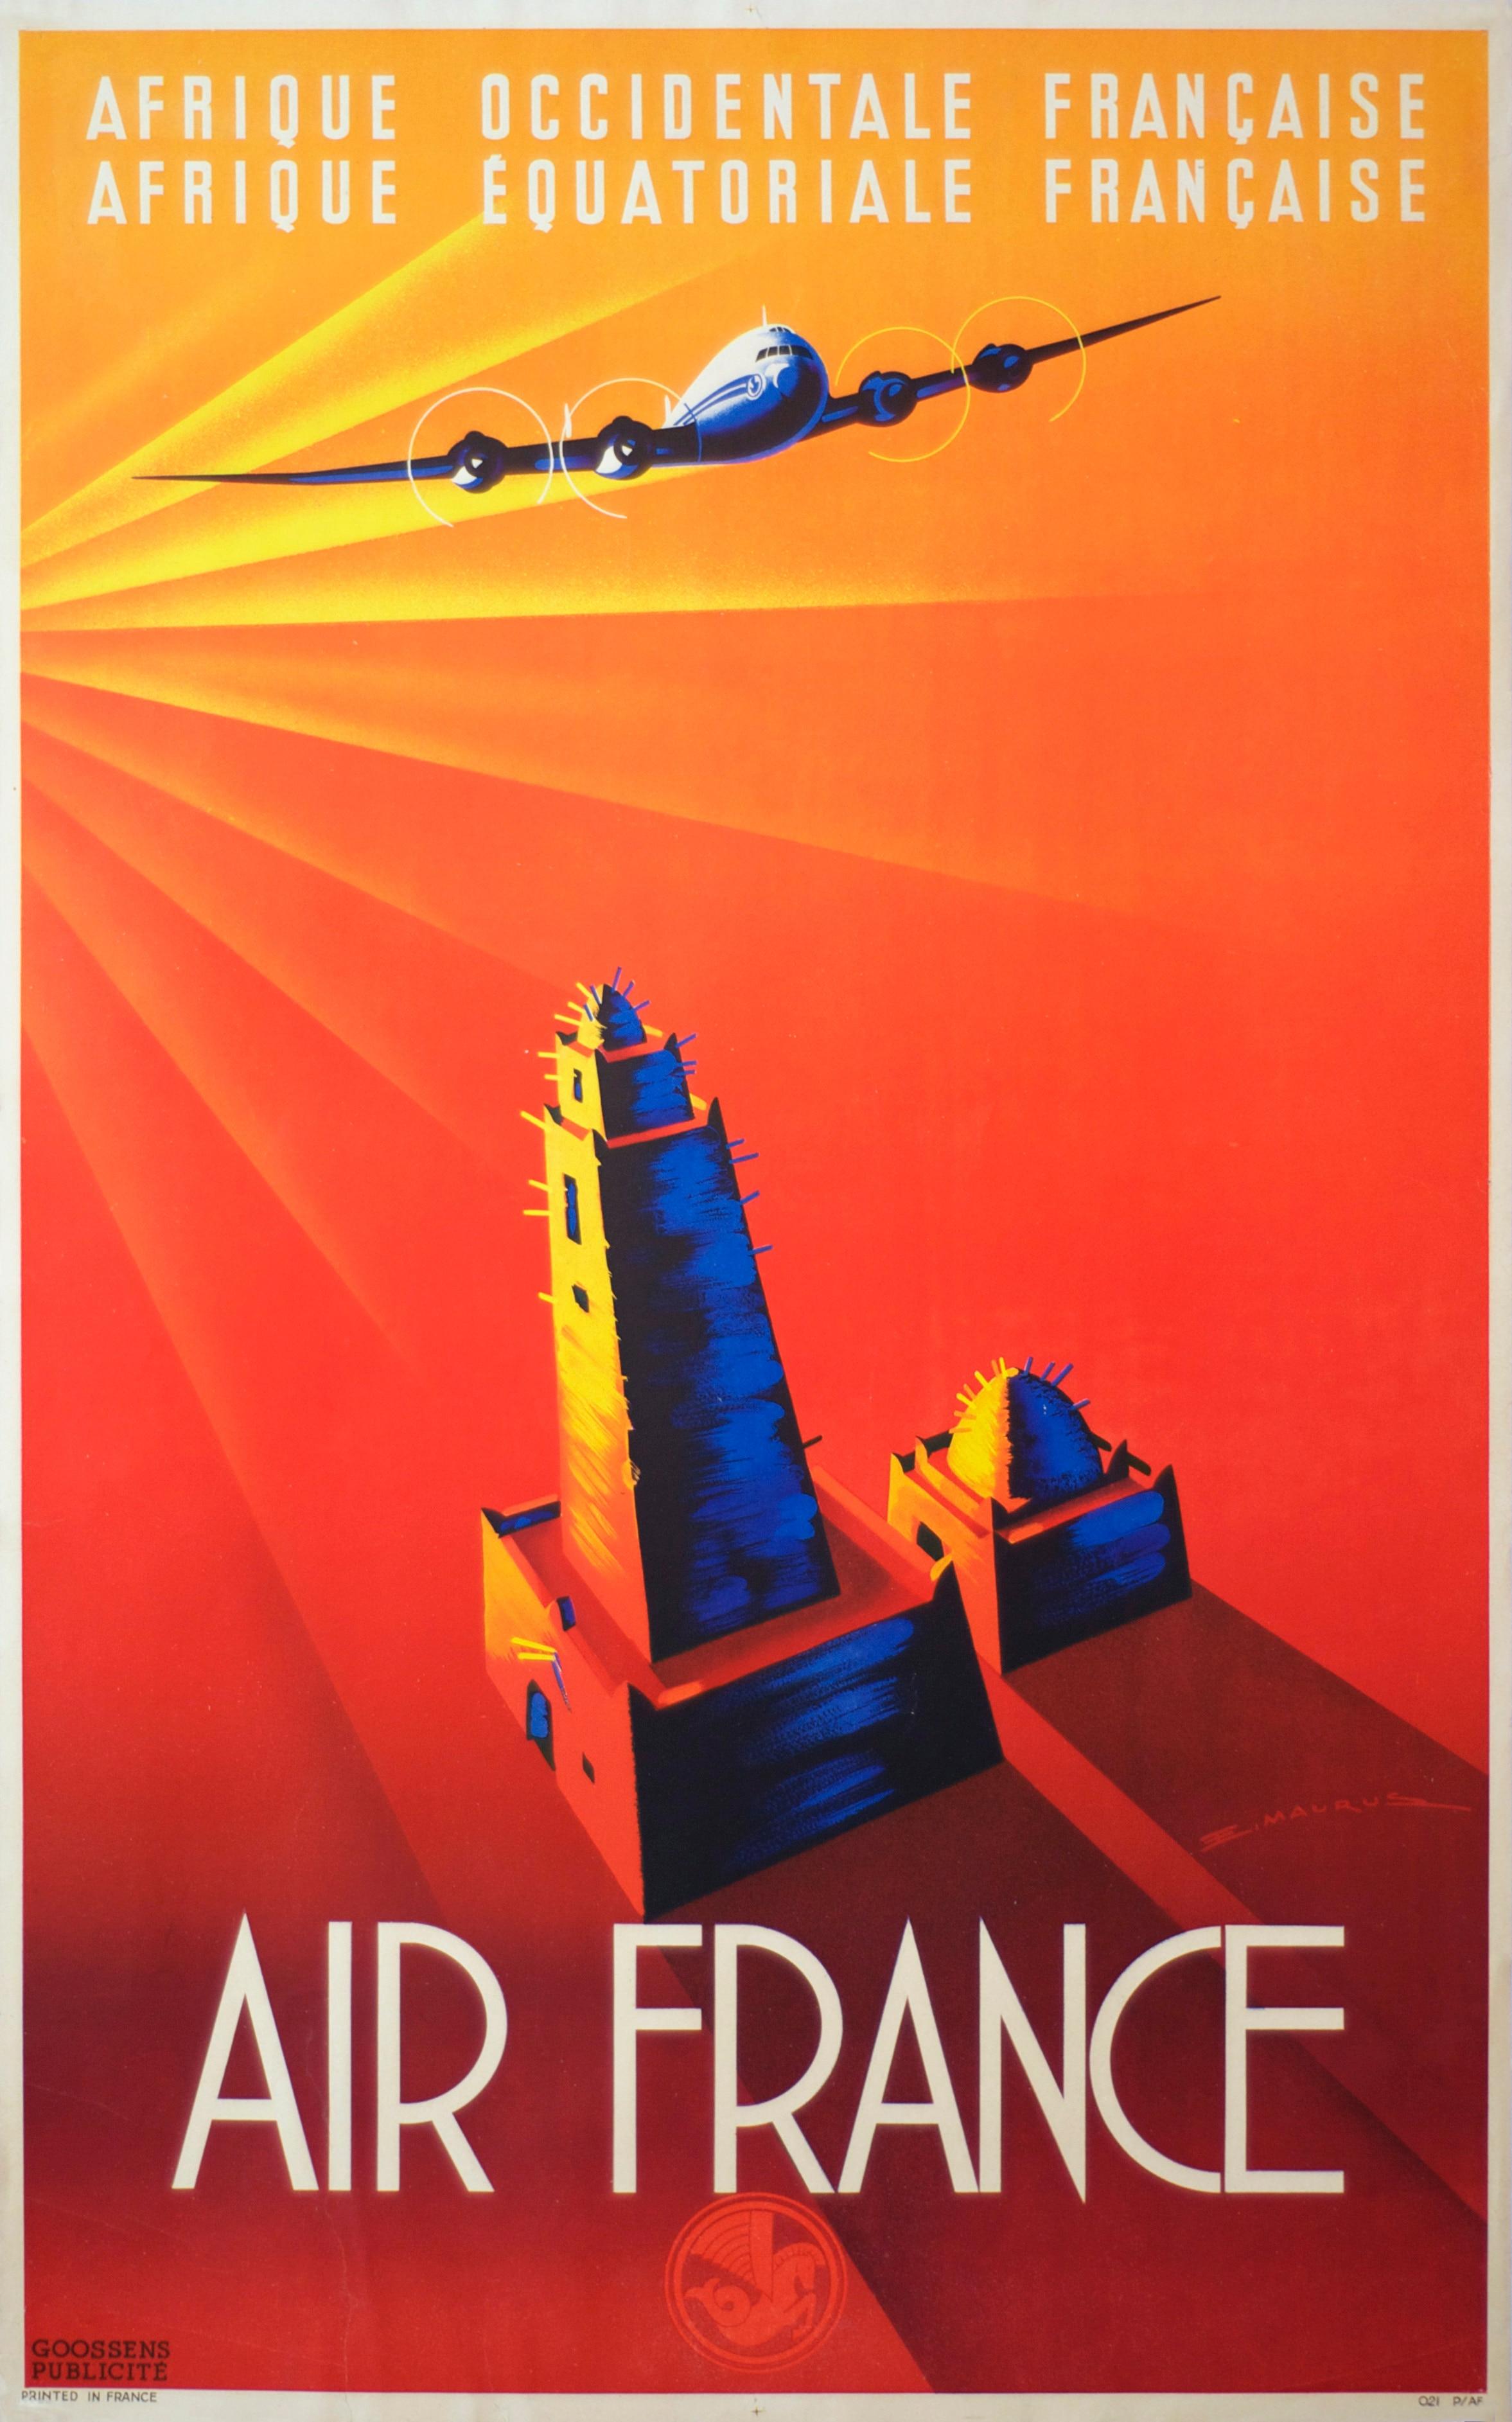 Poster design diy - Air France Dubai Maps Pop Art Retro Vintage Kraft Travel Poster Decorative Diy Wall Sticker Home Bar Posters Decoration